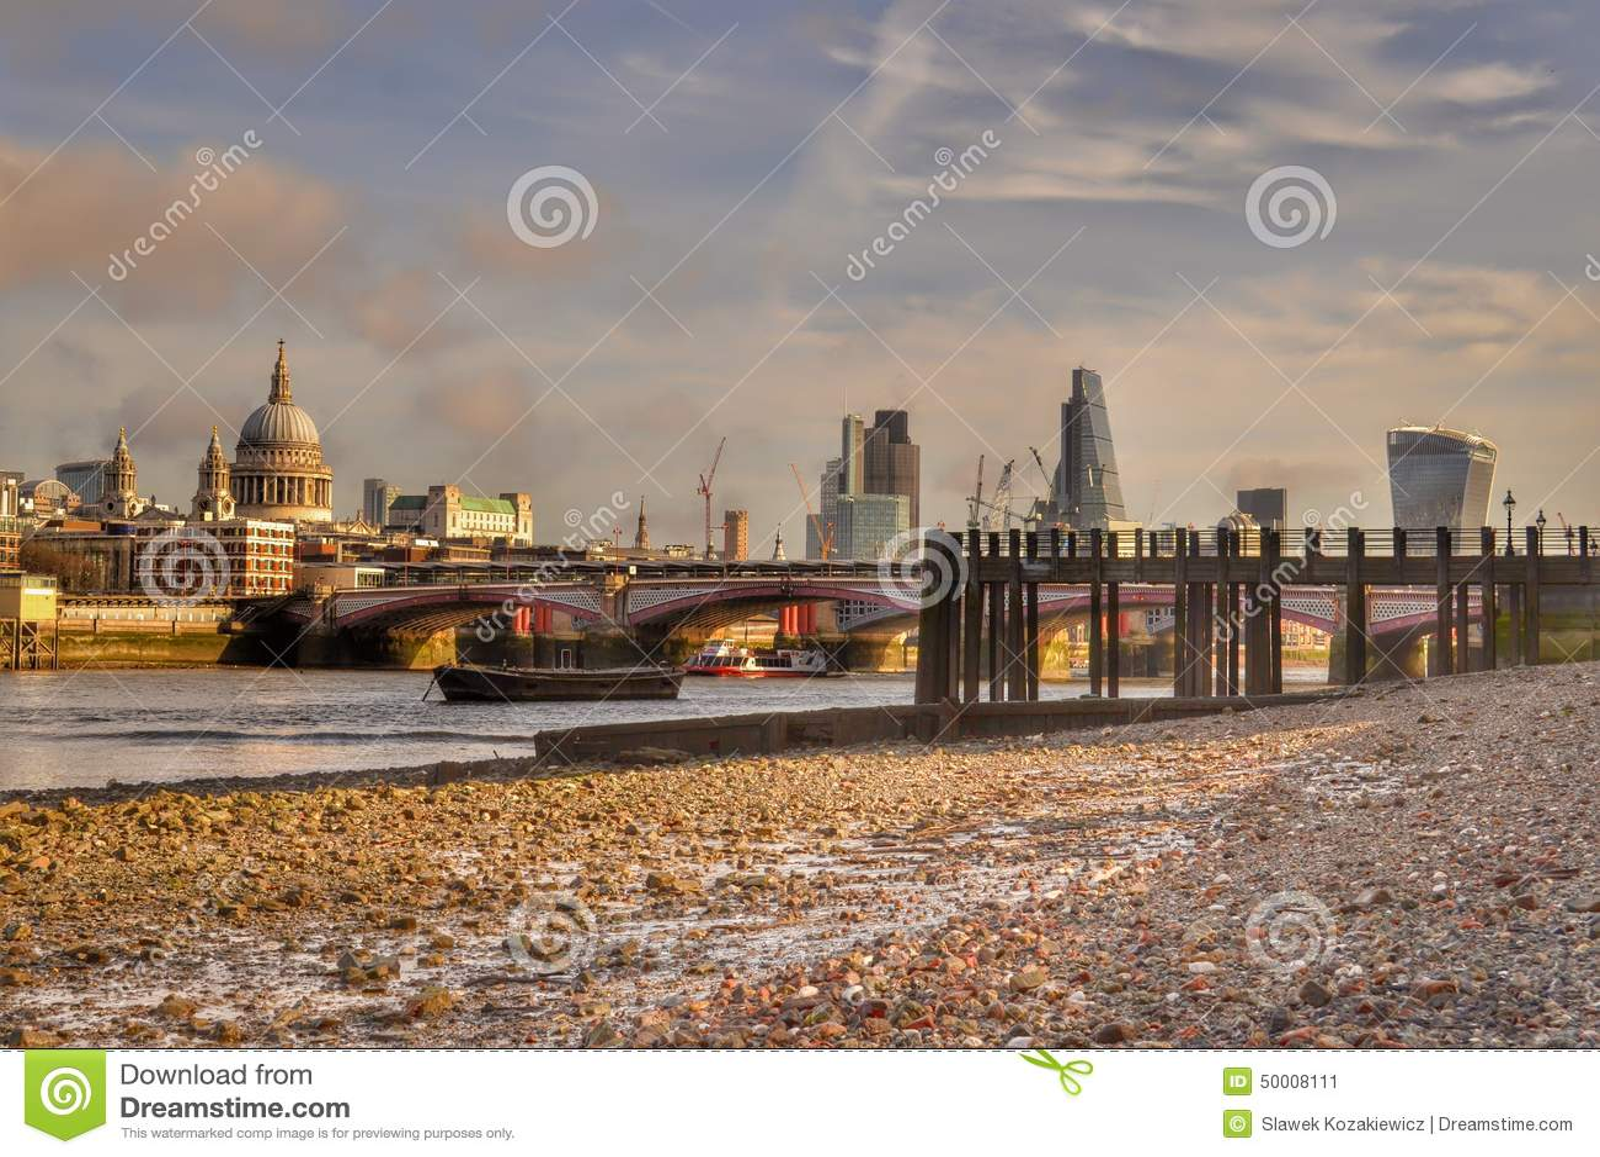 London skyline river Thames low tide